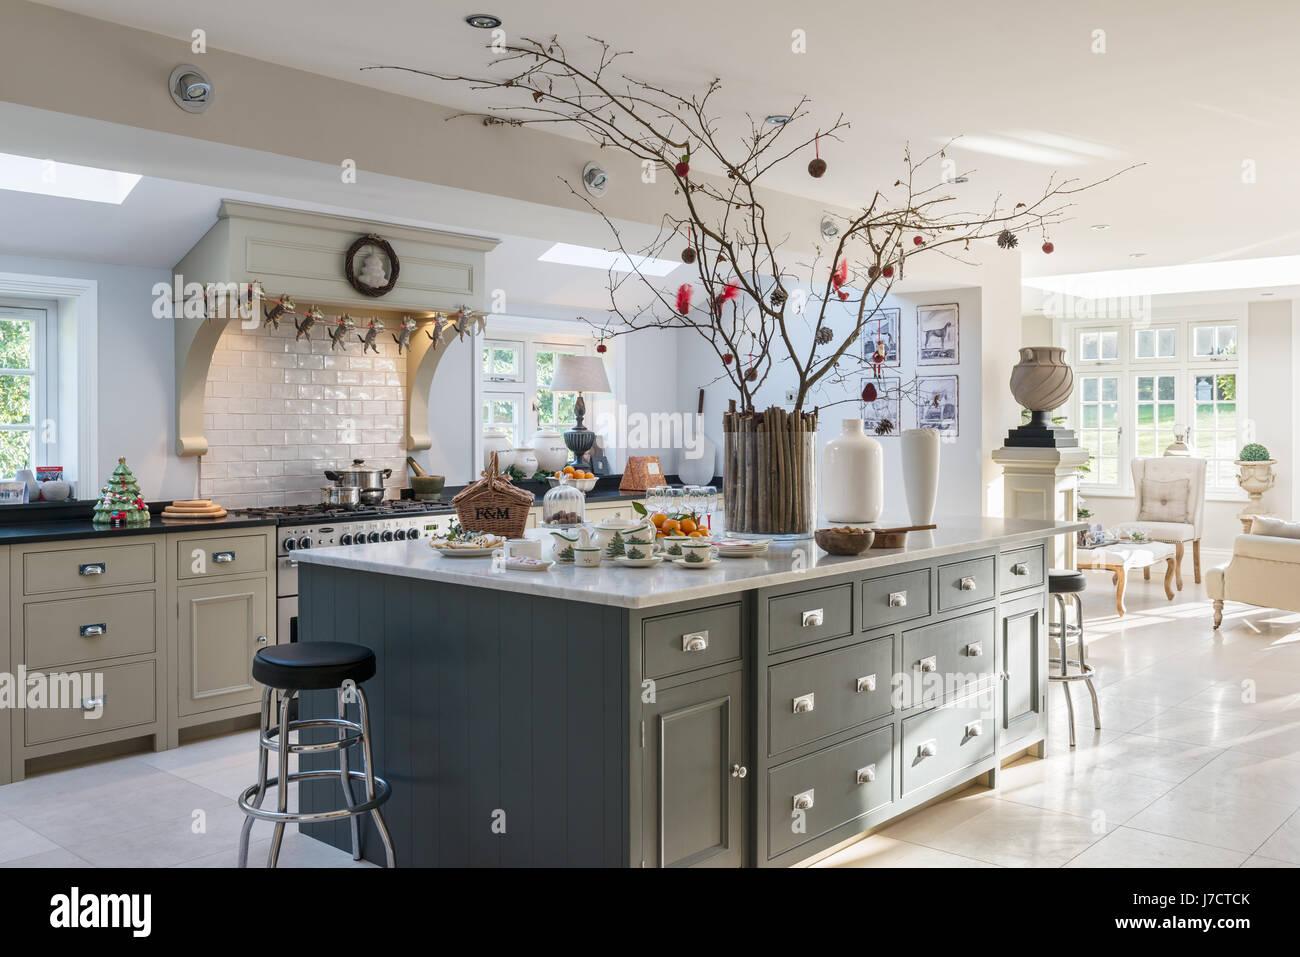 Decorating Kitchen Island For Christmas. kitchen island decor ...